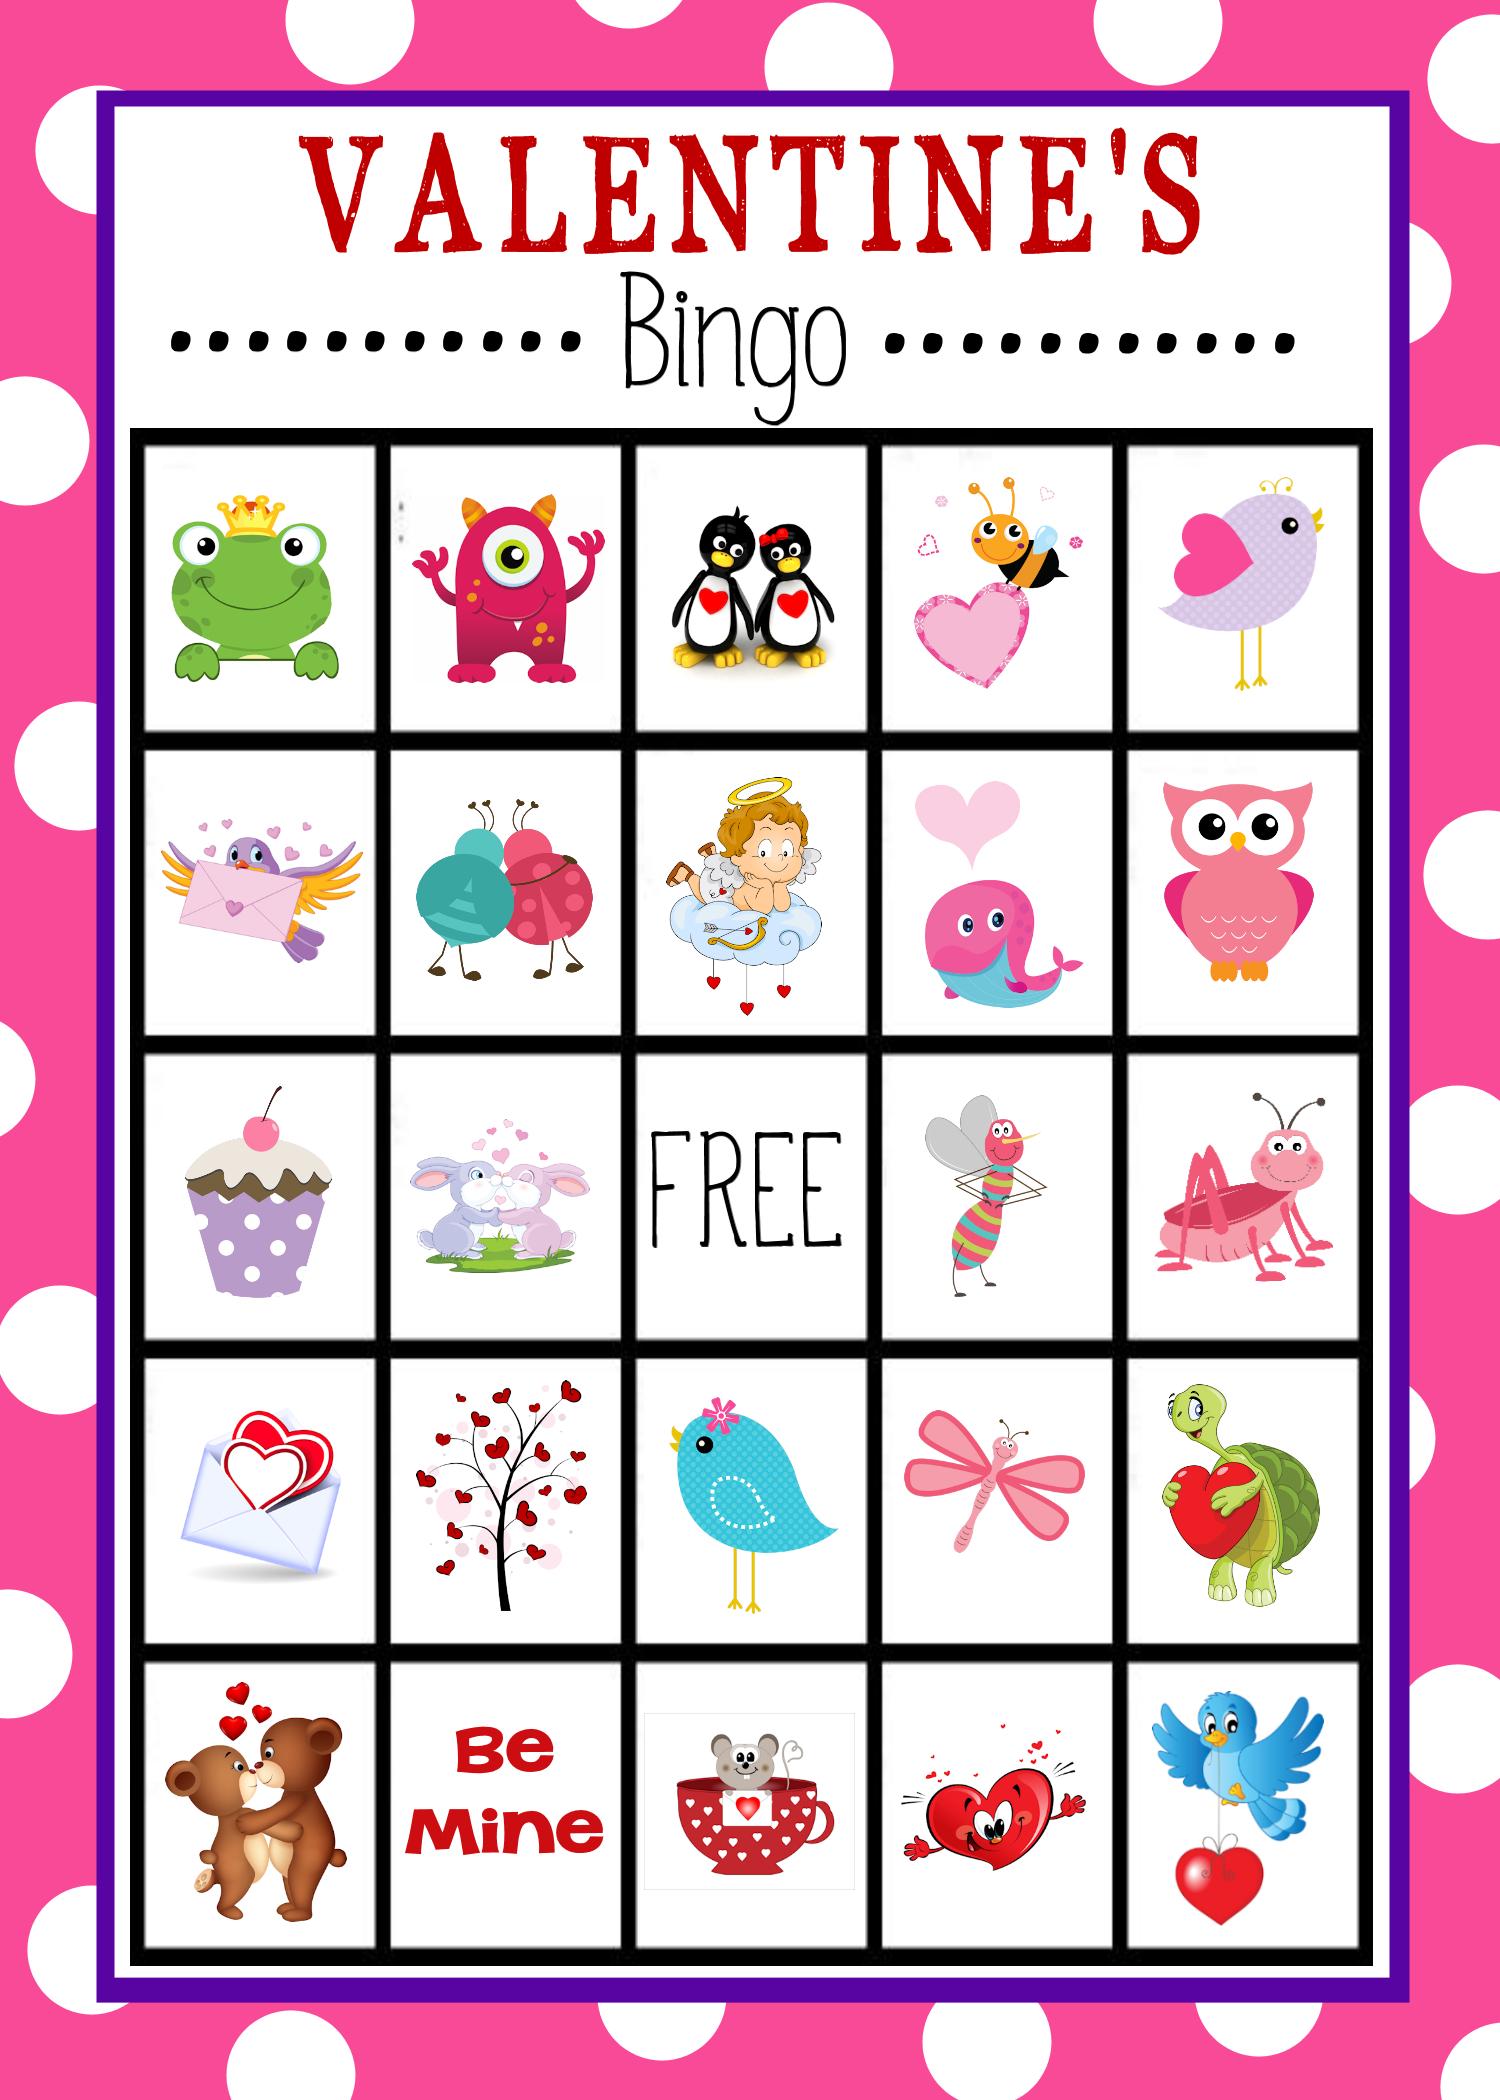 Free Printable Valentine's Day Bingo Game   Valentine's Day - Free Printable Valentines Bingo